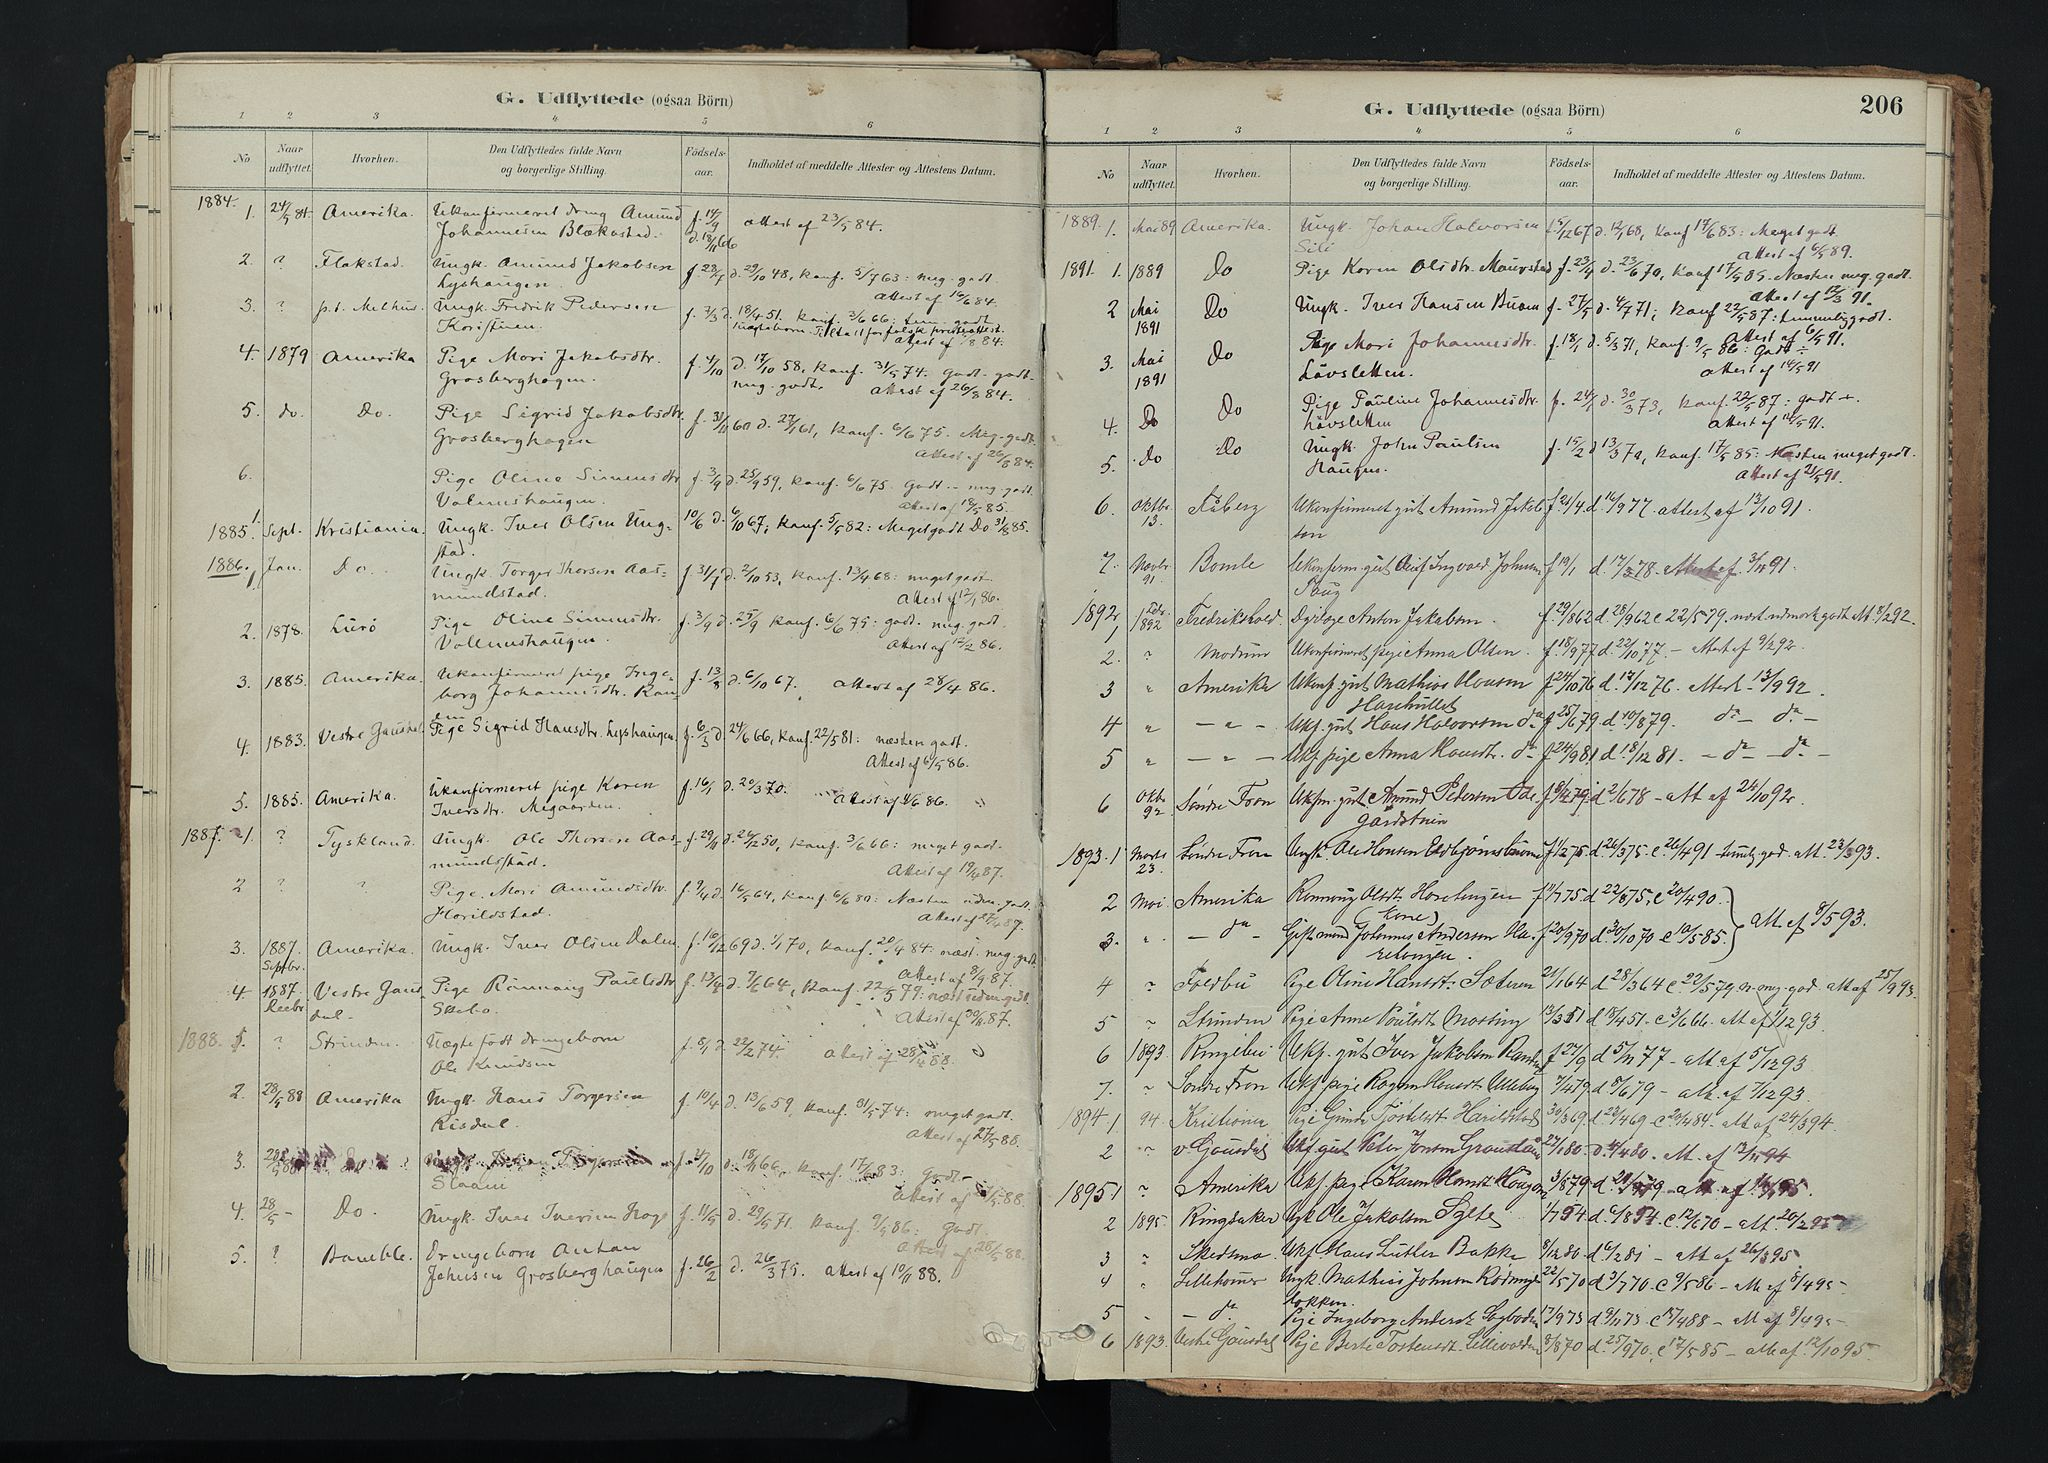 SAH, Nord-Fron prestekontor, Ministerialbok nr. 5, 1884-1914, s. 206